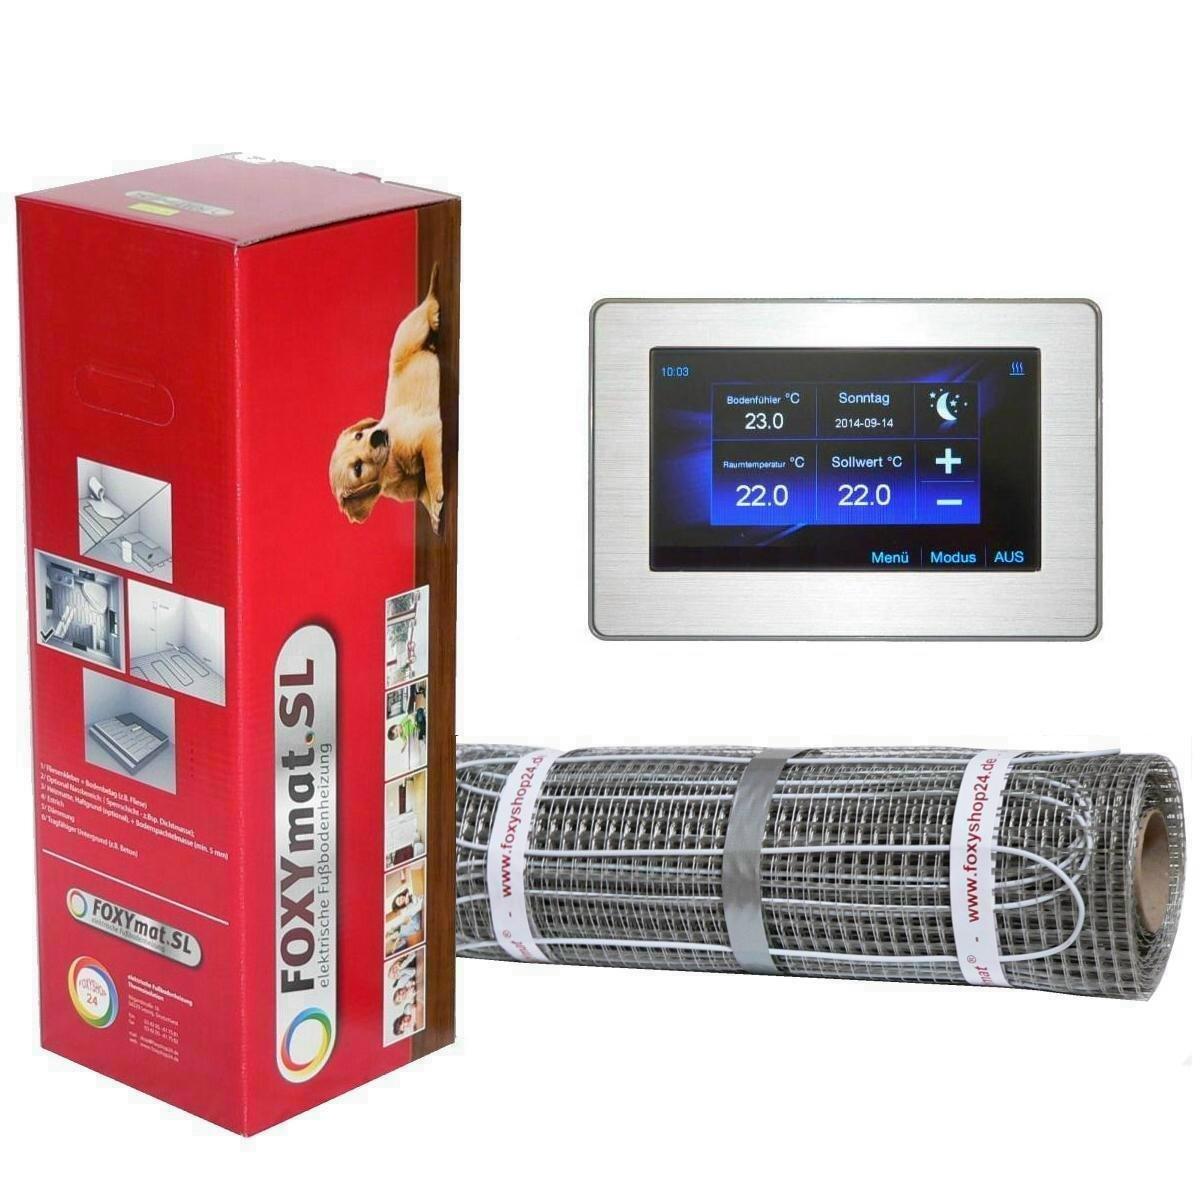 mit Thermostat FOXYREG CTFT,Komplett-Set 3.5 m/² 0.5m x 7m FOXYSHOP24-elektrische Fu/ßbodenheizung PREMIUM MARKE FOXYMAT.SL 160 Watt pro m/²